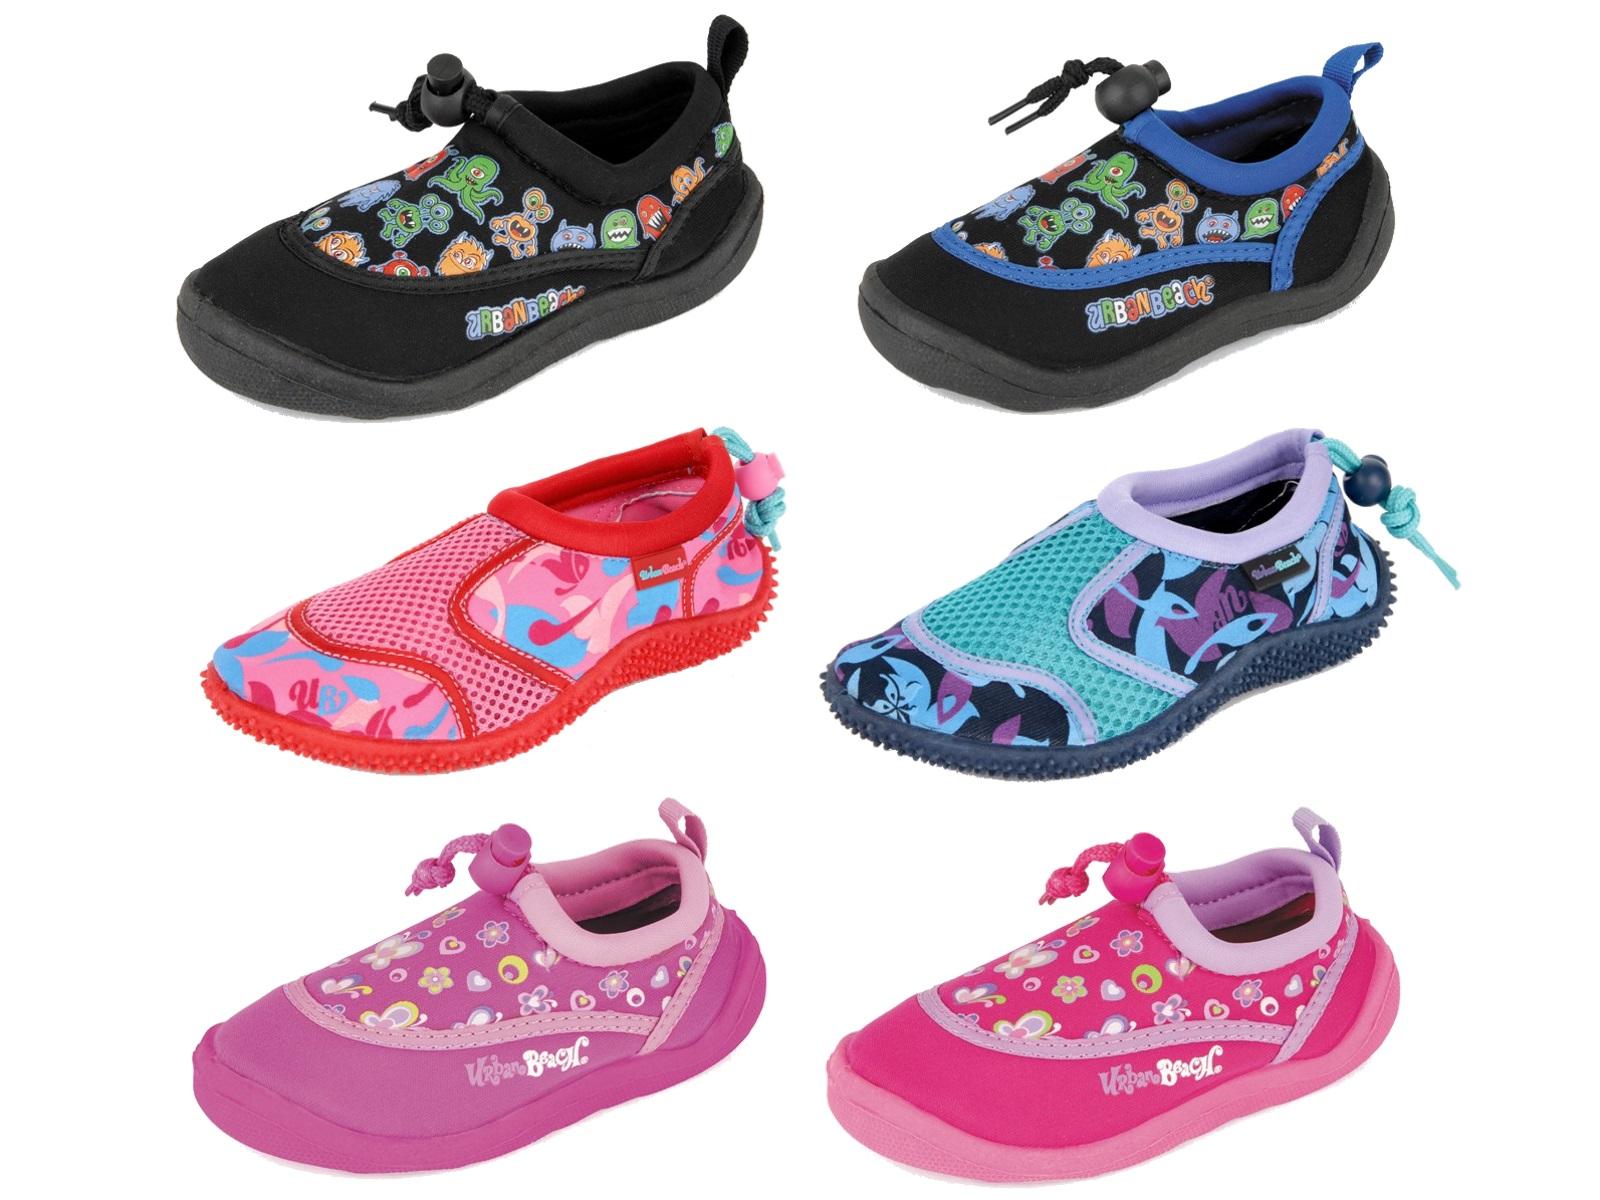 30e836c07aa7 Kids Boys Girls Urban Beach Aqua Socks Sandals Beach Swim Sea Surf ...